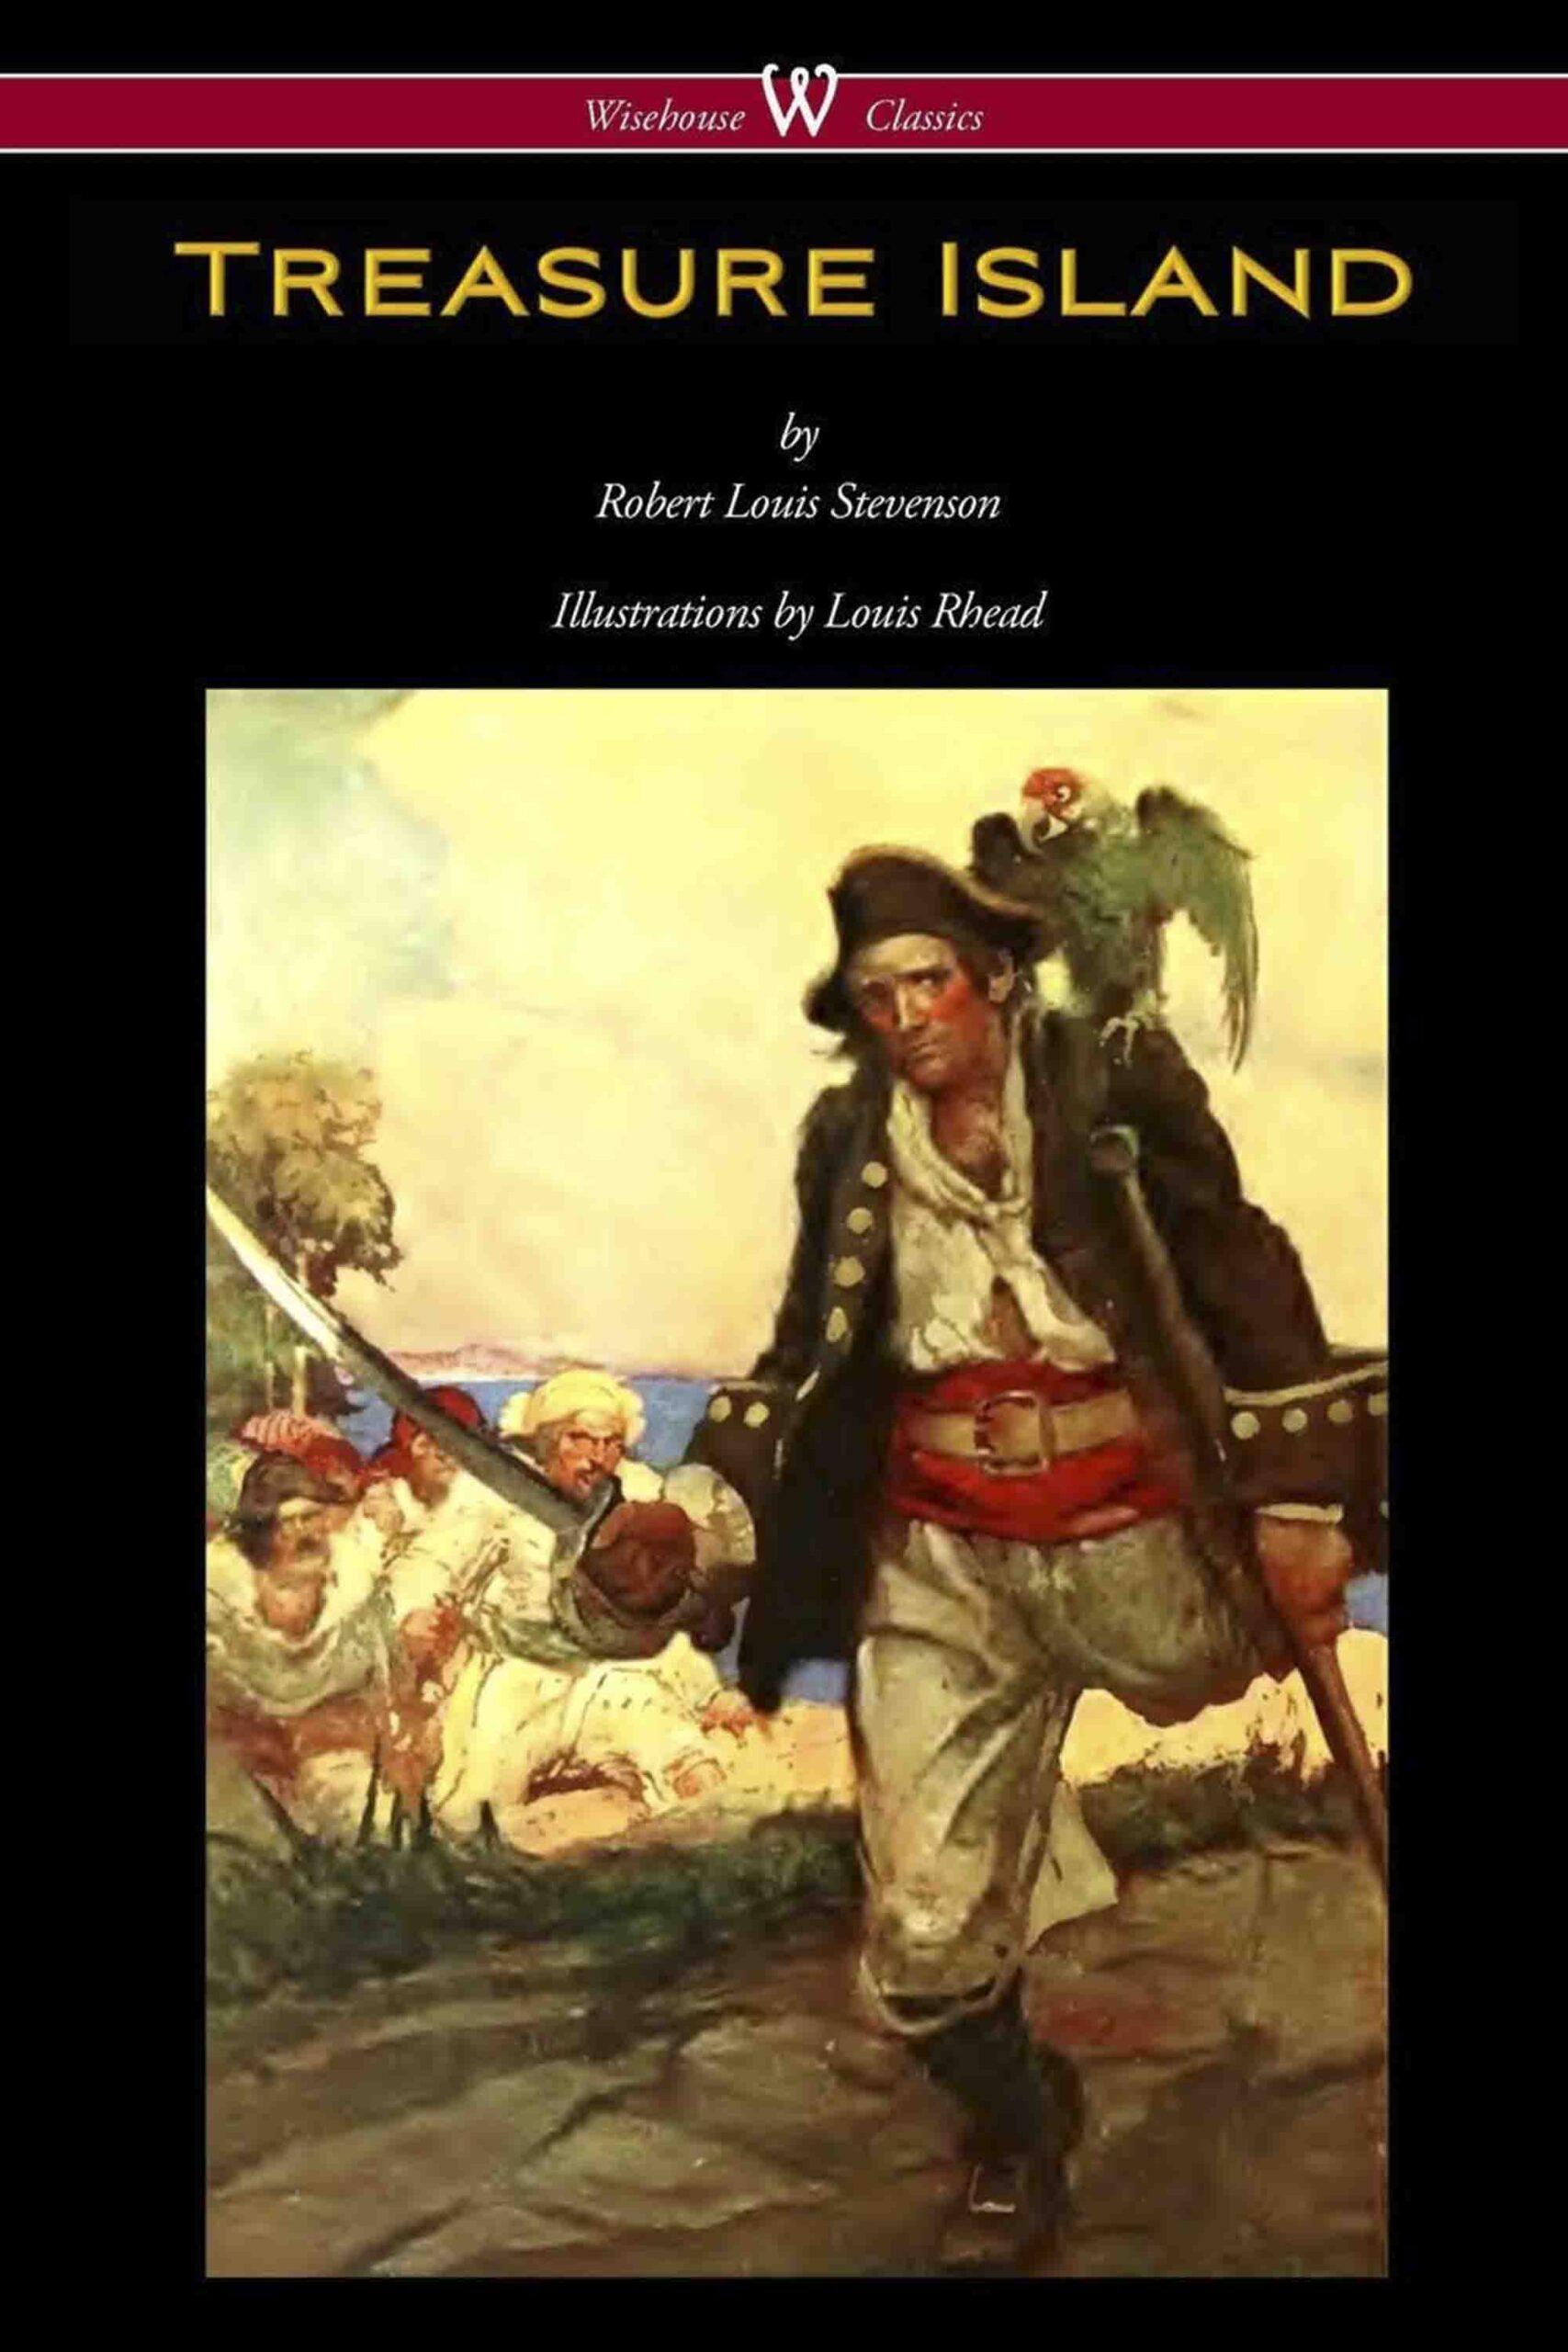 Treasure Island (Wisehouse Classics Edition – With Original Illustrations by Louis Rhead)